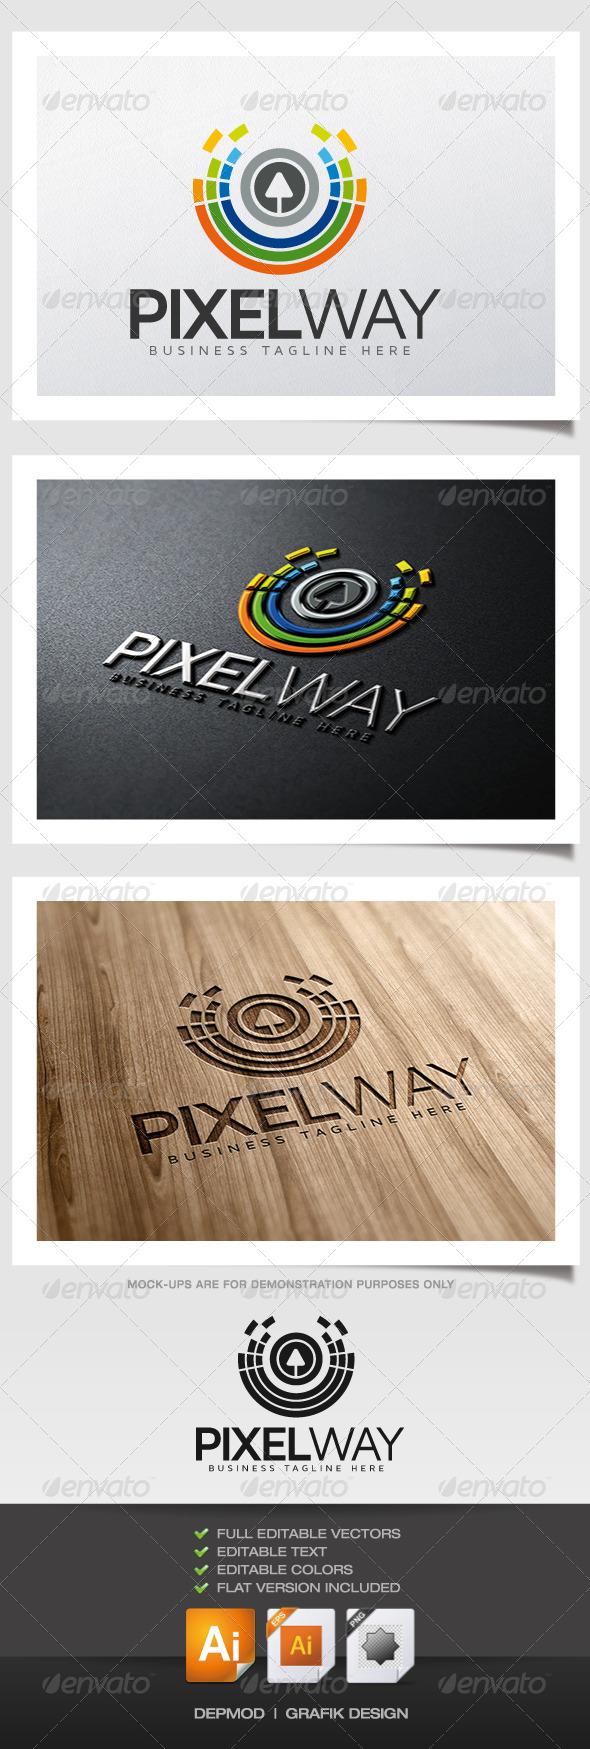 Pixel Way Logo - Abstract Logo Templates